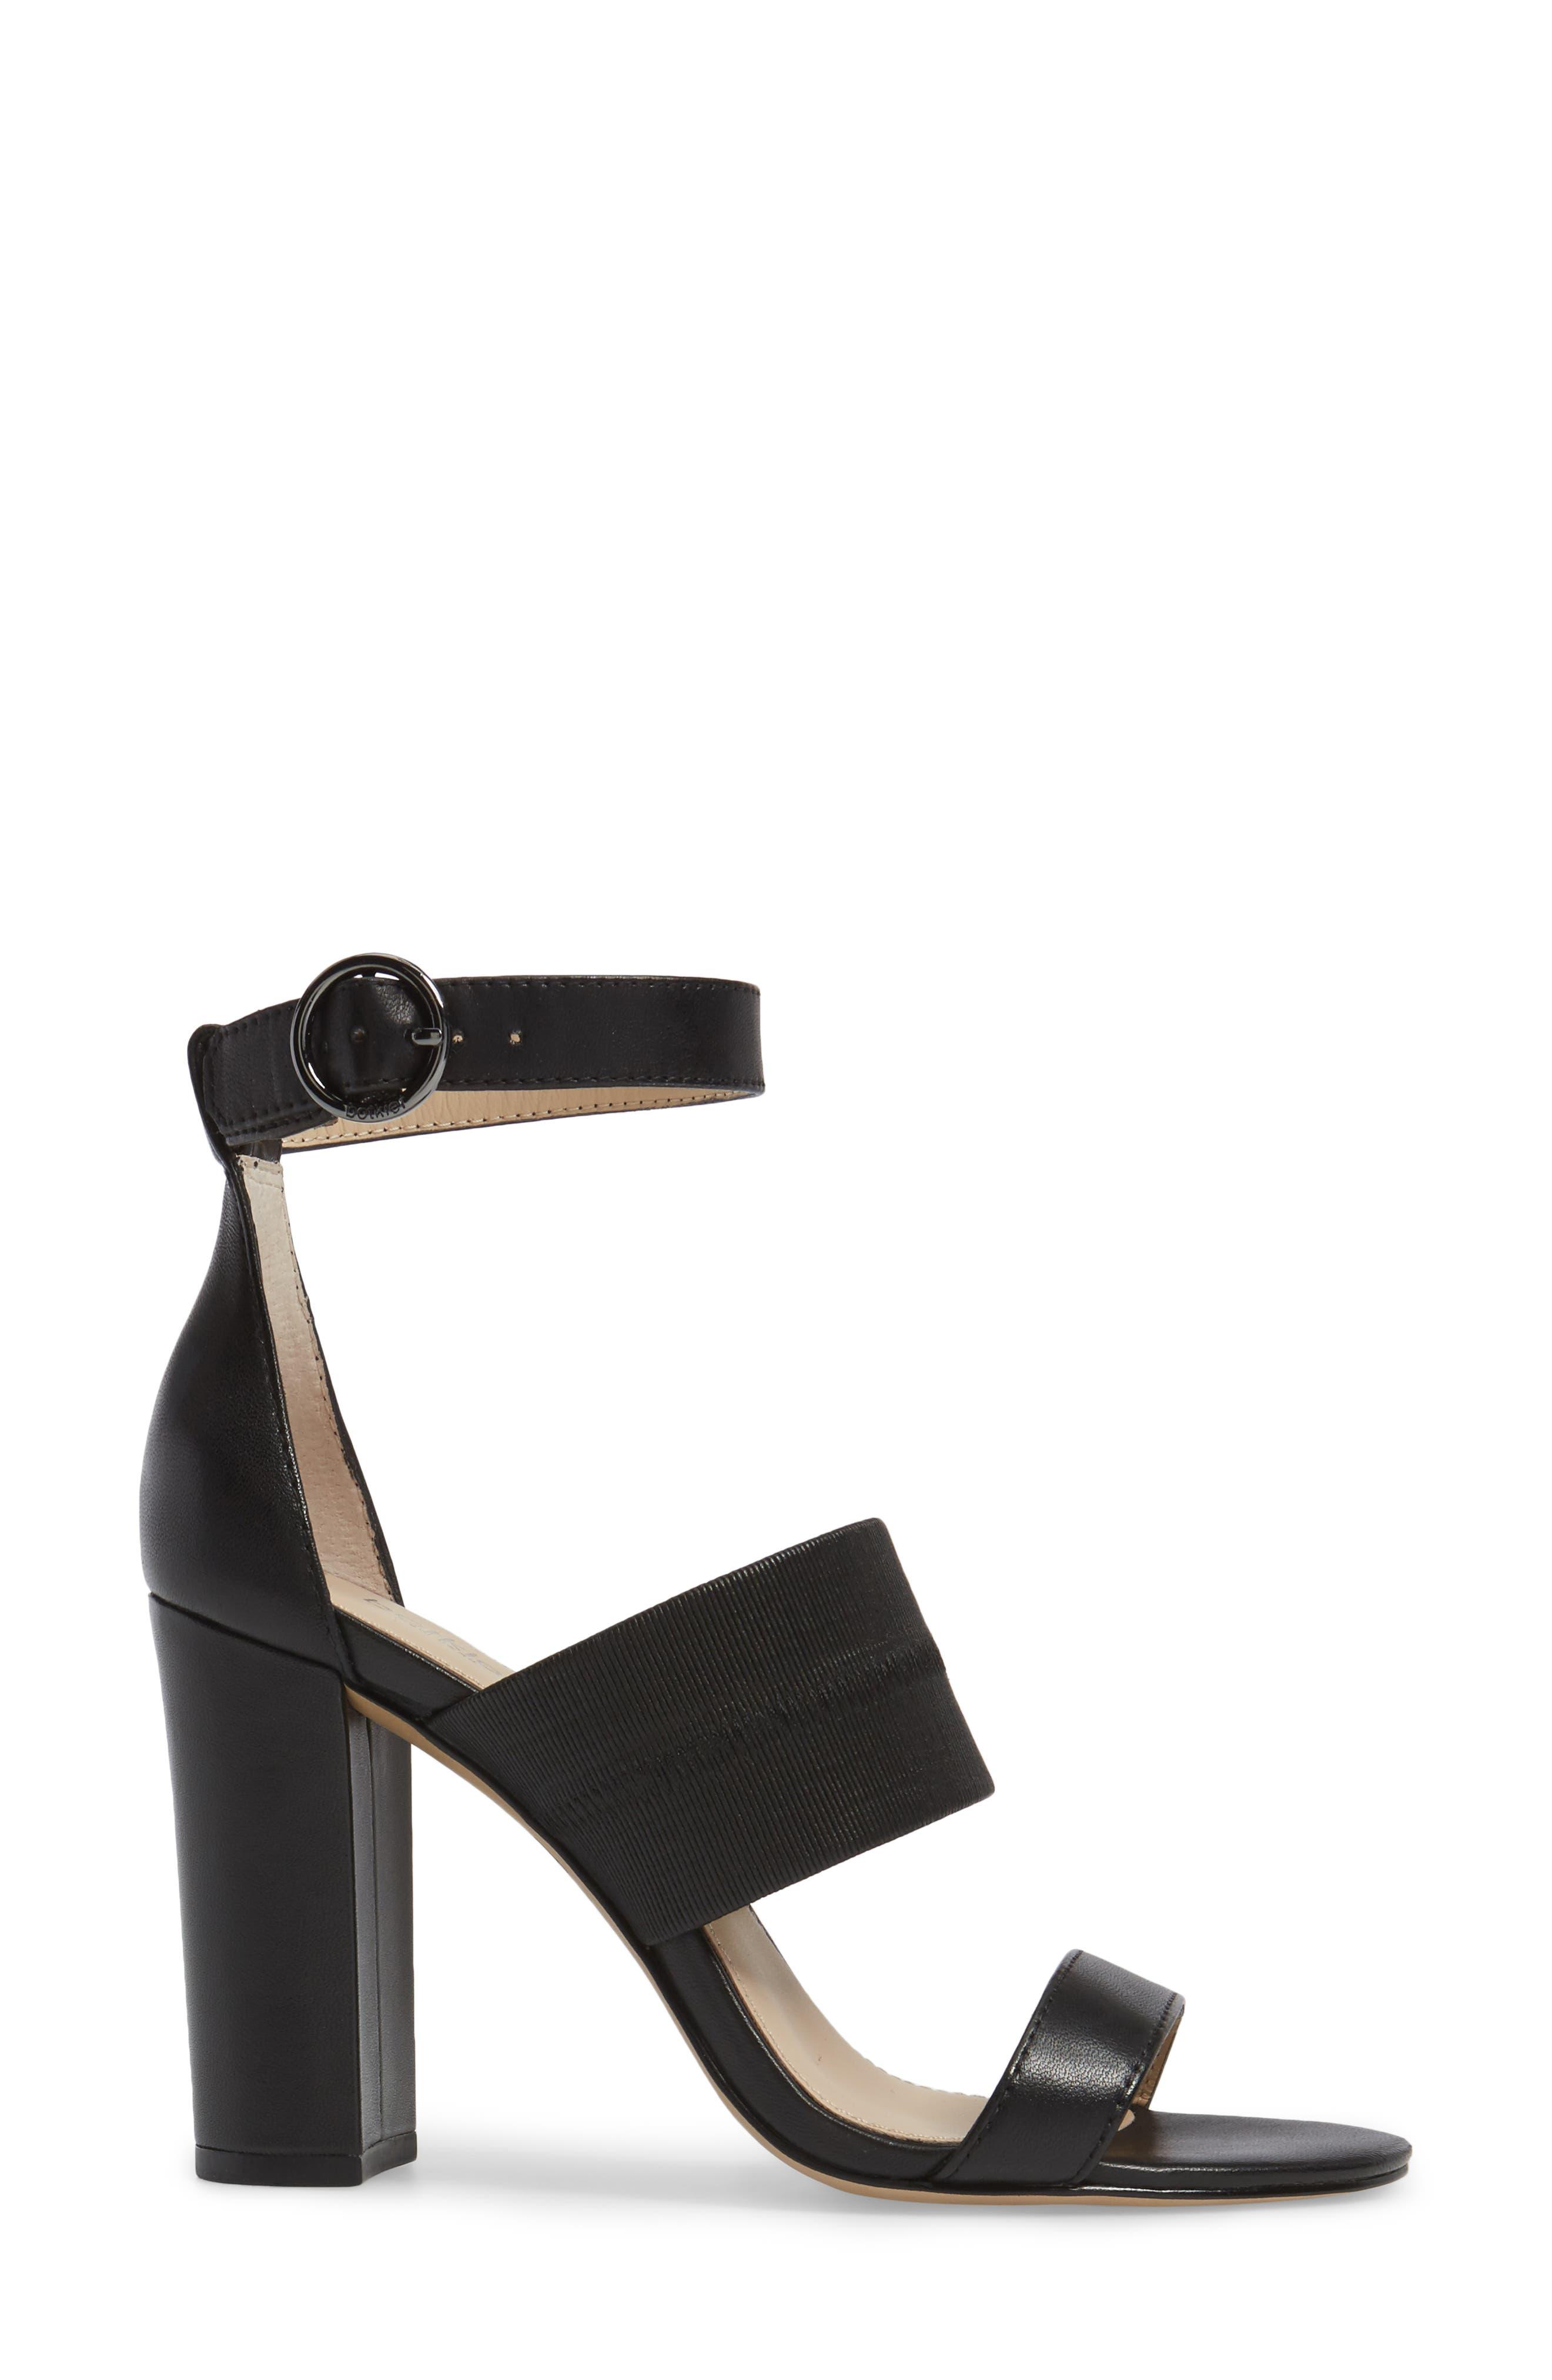 Gisella Ankle Strap Sandal,                             Alternate thumbnail 3, color,                             001